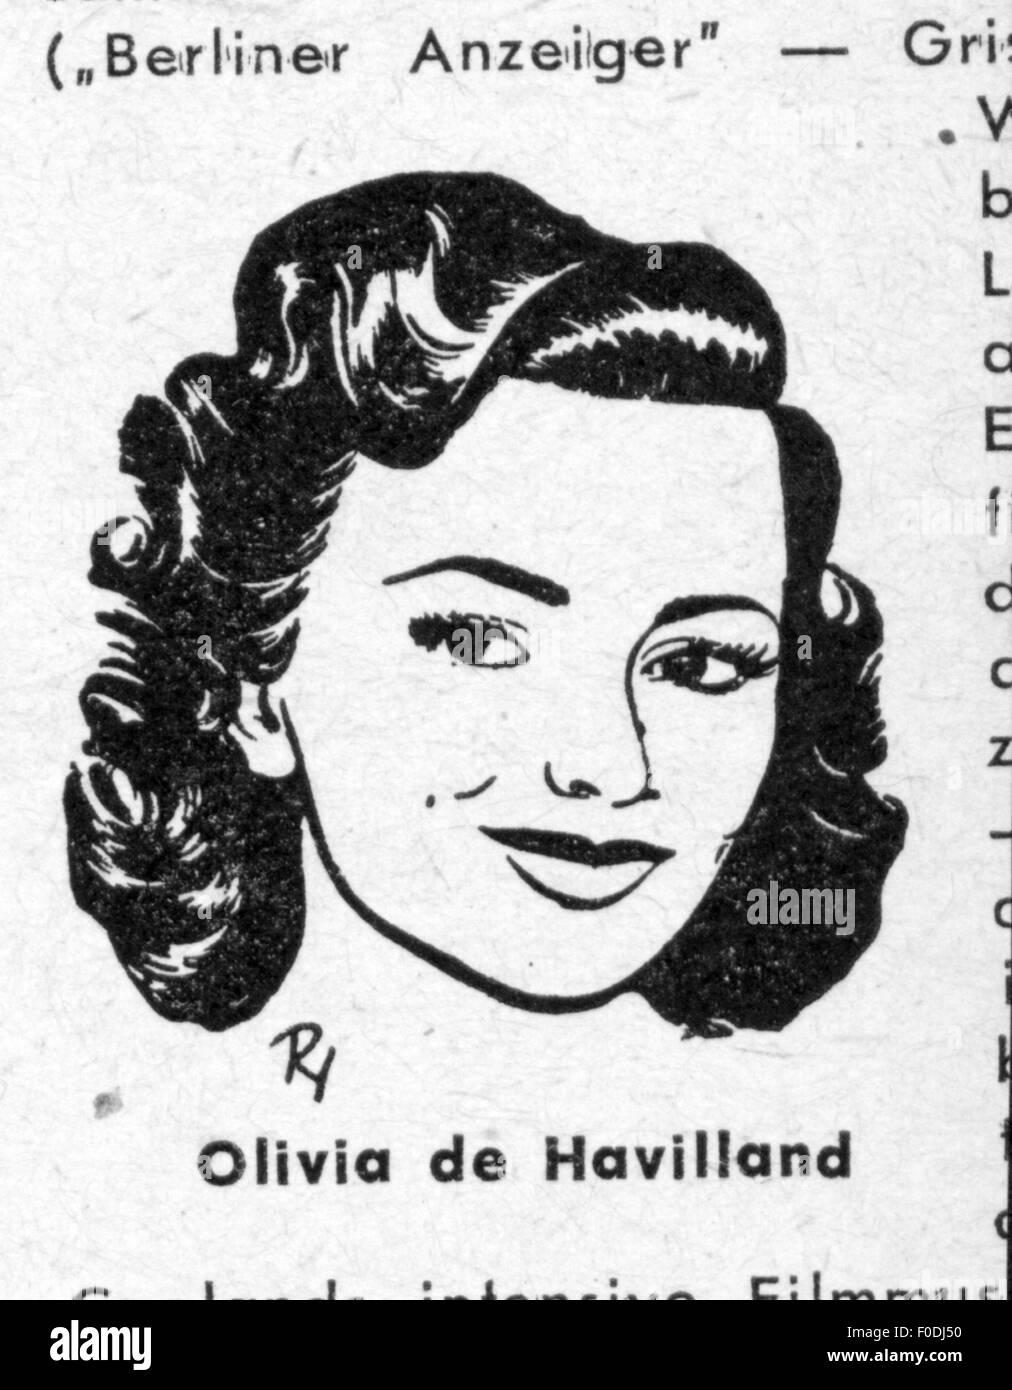 Havilland, Olivia de, * 1.7.1916, American actress, portrait, drawing by Centfox-Hofmann, circa 1949, Additional - Stock Image